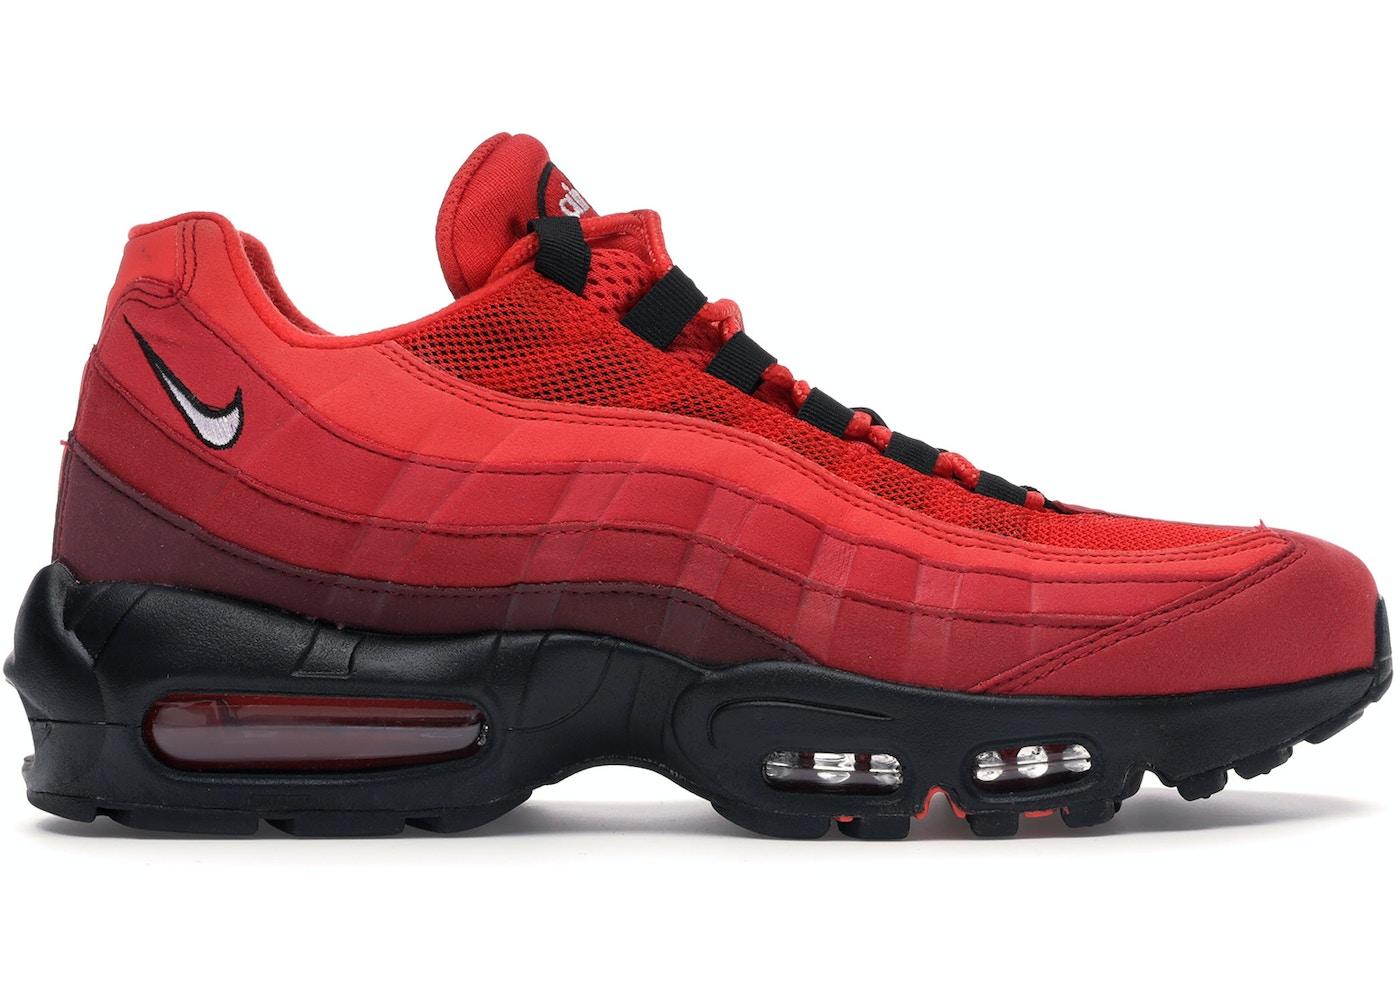 wholesale dealer 189b9 d6ba6 Buy Nike Air Max 95 Shoes & Deadstock Sneakers